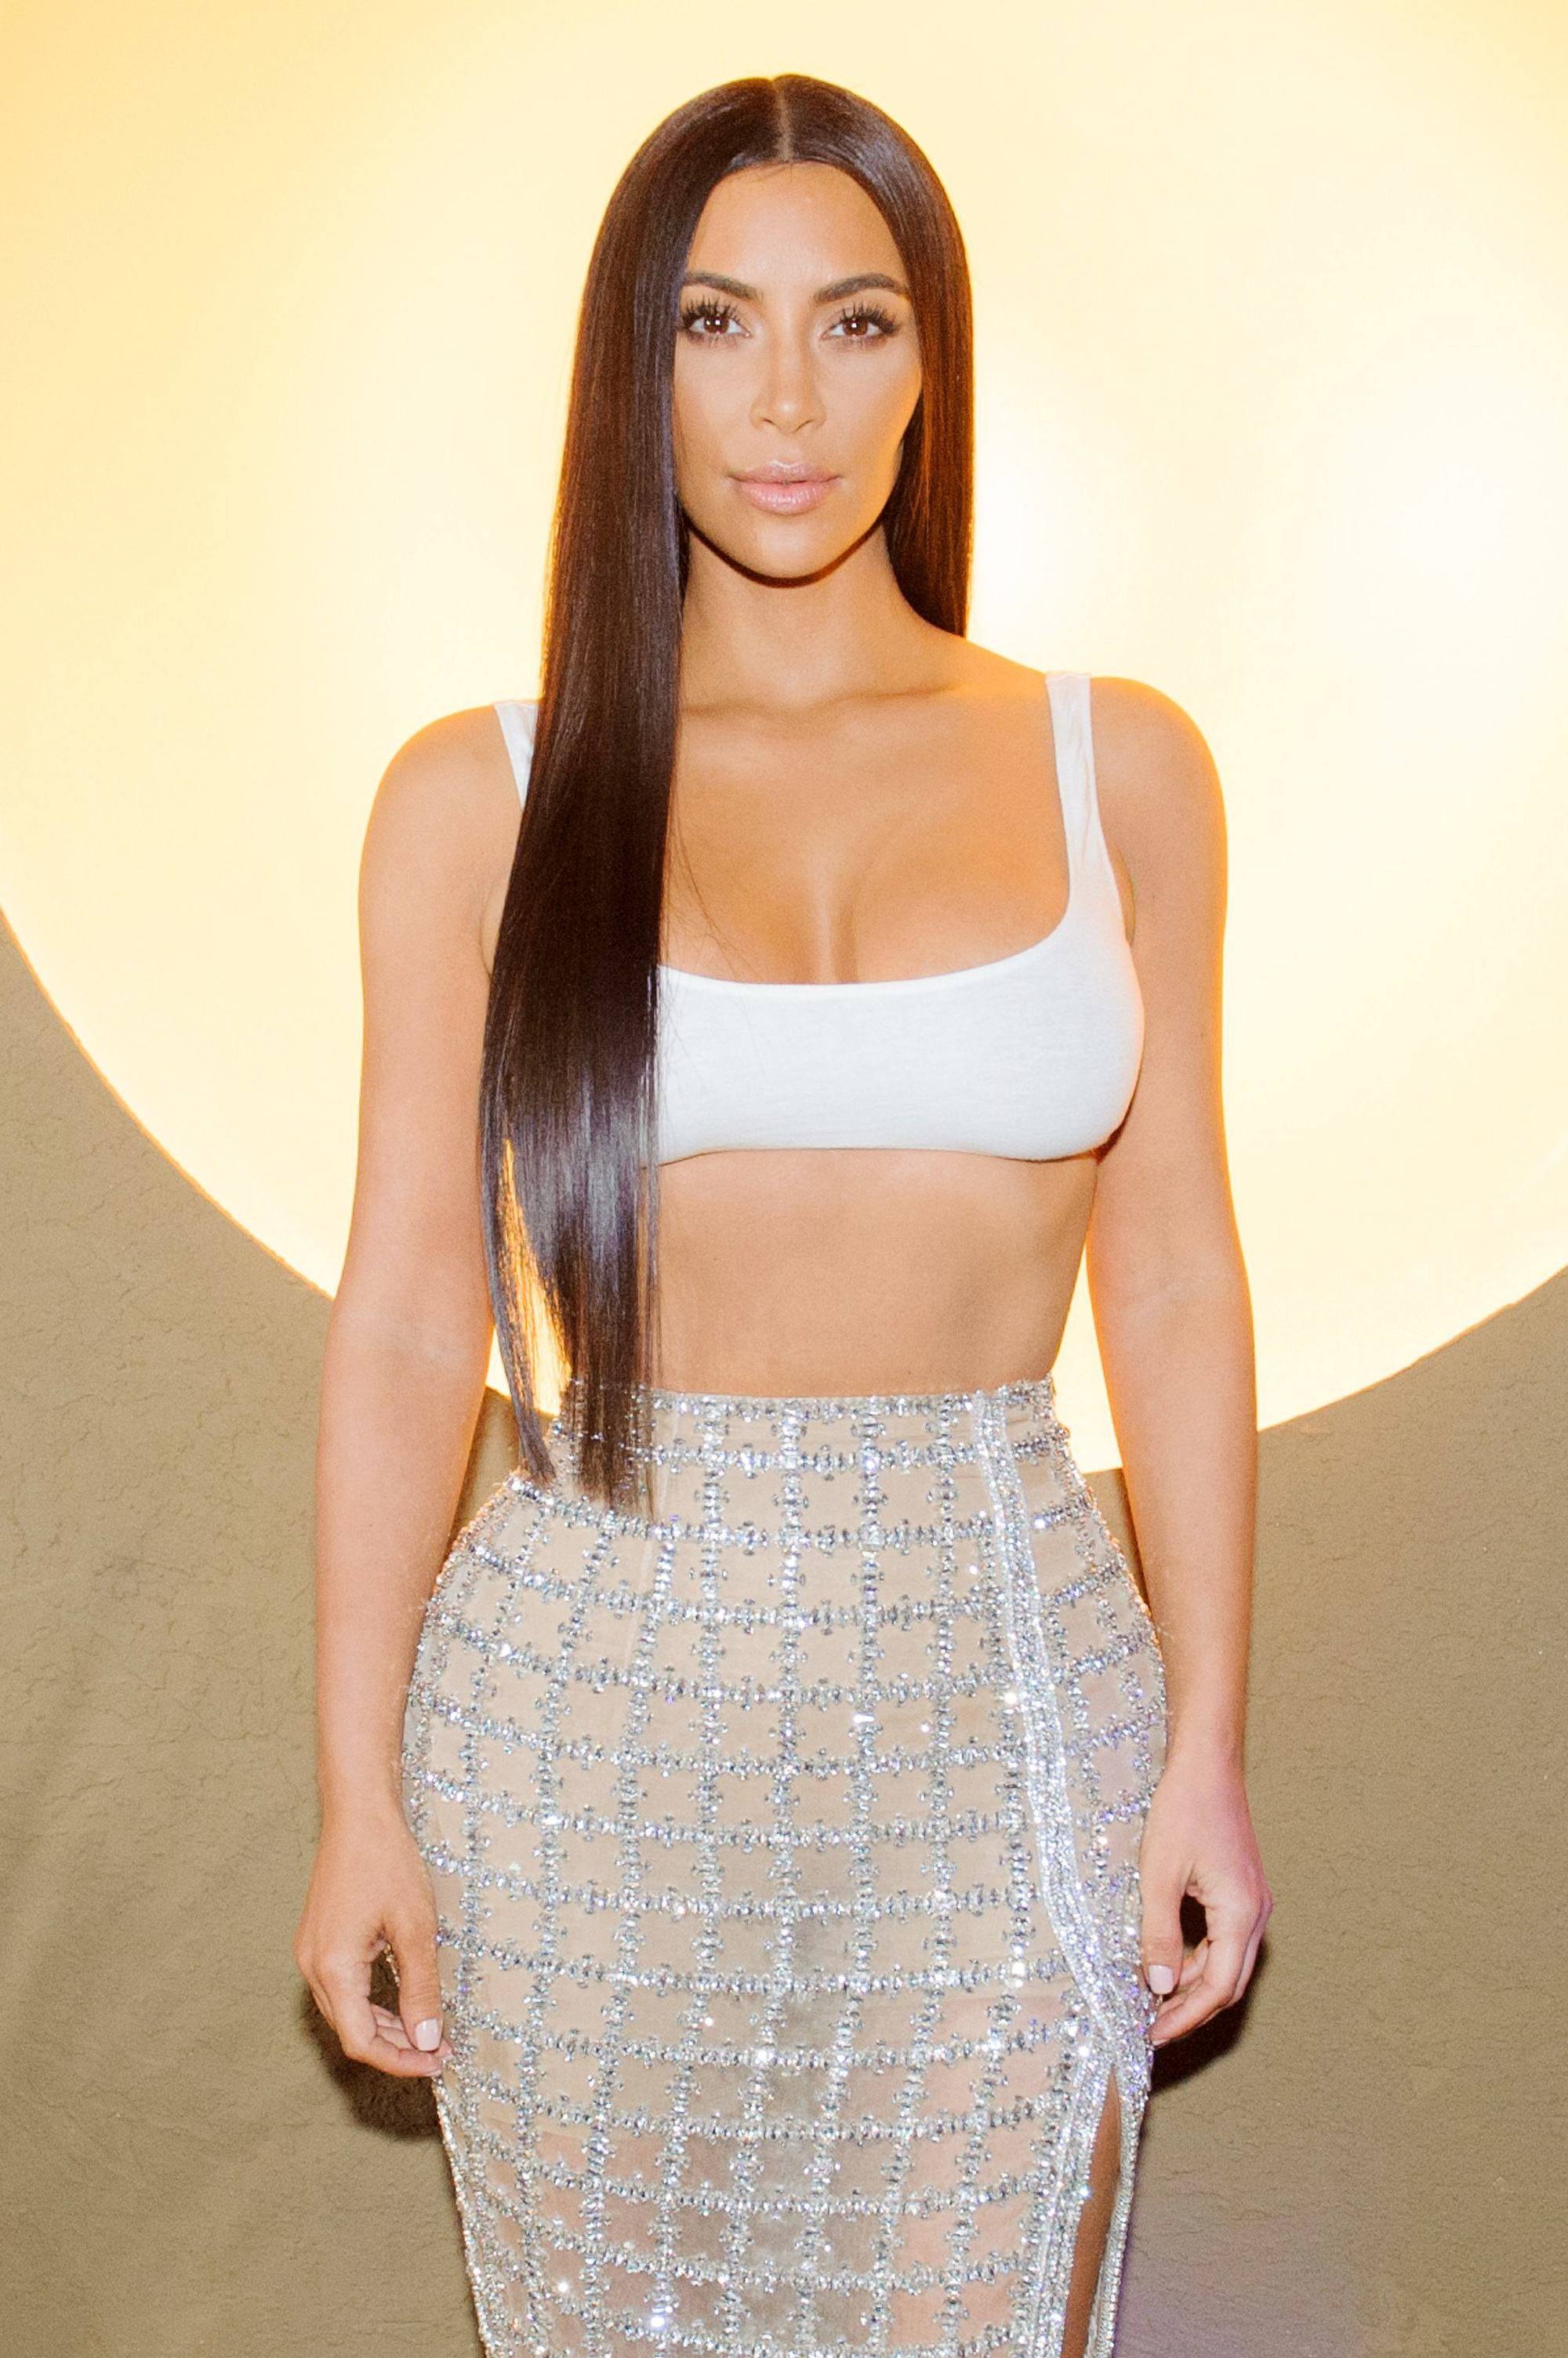 Kim Kardashian rapunzel long straight black hair over one shoulder